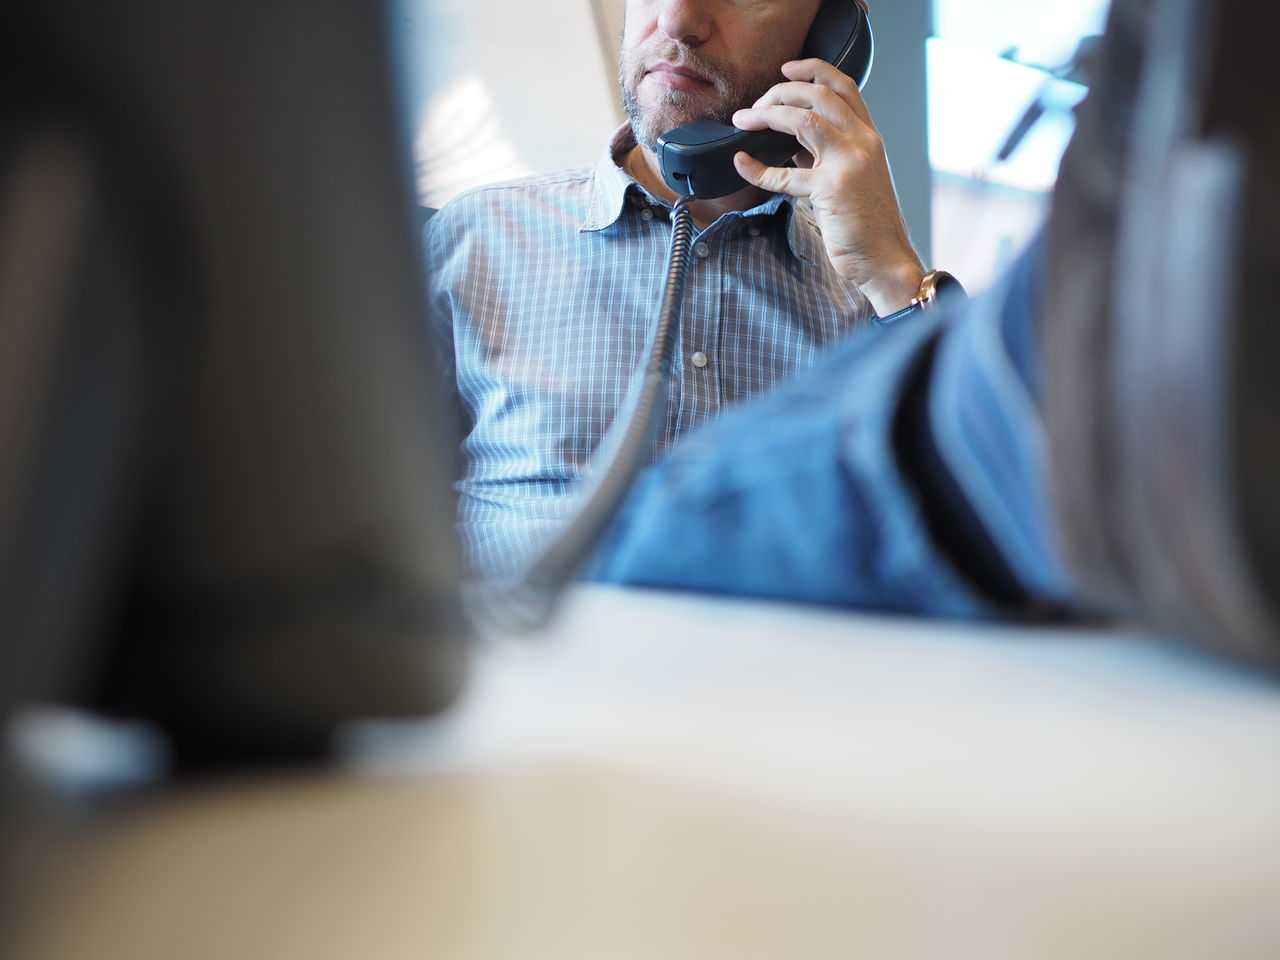 Business Business Person Businessman Call Communication Keyboard Man Man Head Monitor Negotiate Office Office Office View Officeman One Person Phone Shirt Shirt Man Telephone Telephone Cable Telephone Line Work Work Man Working Employed